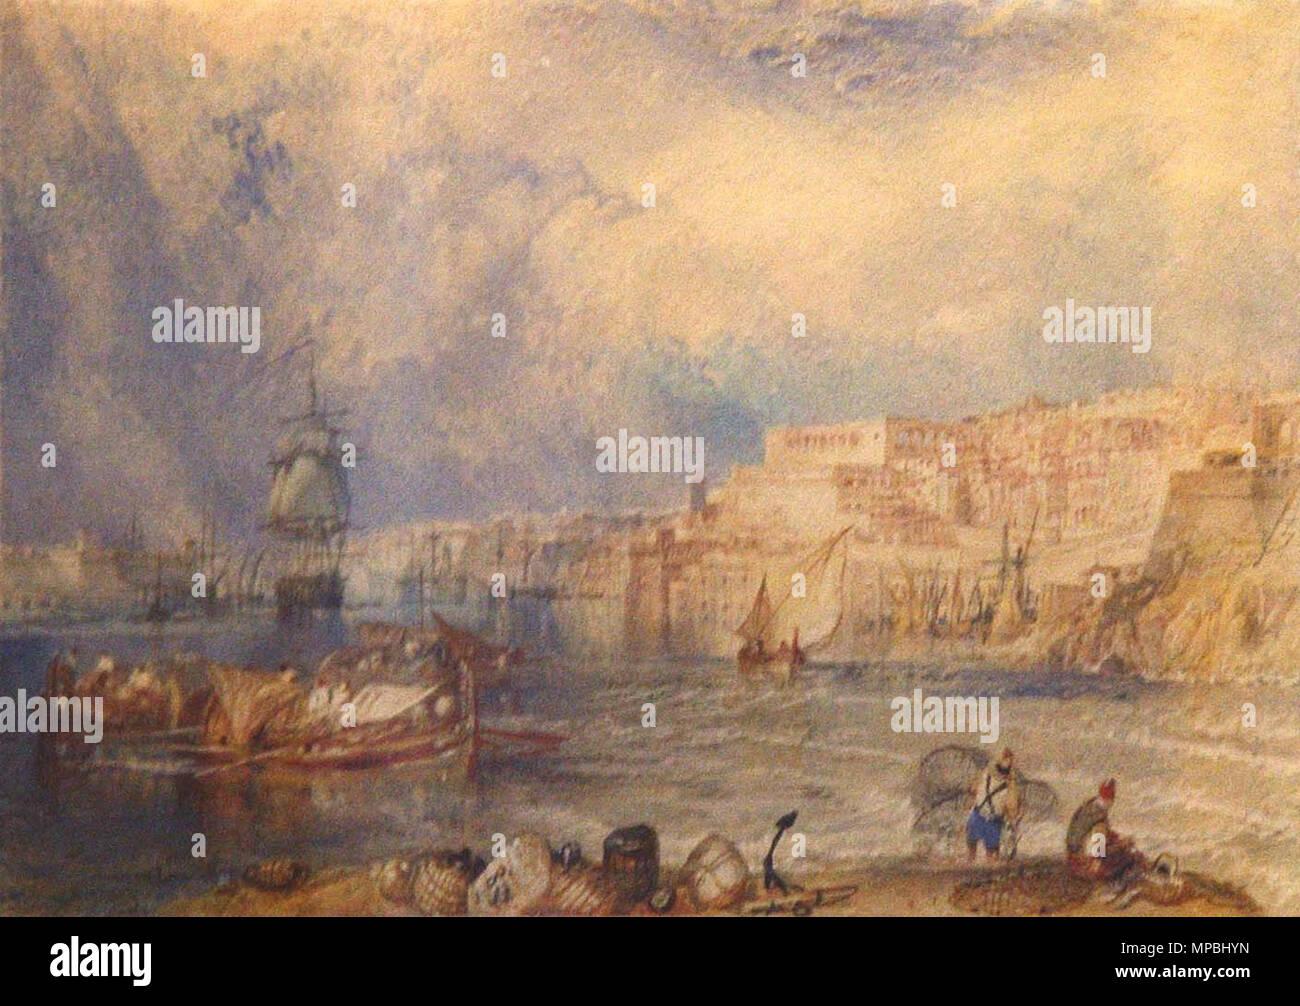 William Turner Joseph Mallord William Turner Bei Kunstkopie De Alle Kunstdrucke Gemalde Bei Kunstkopie De